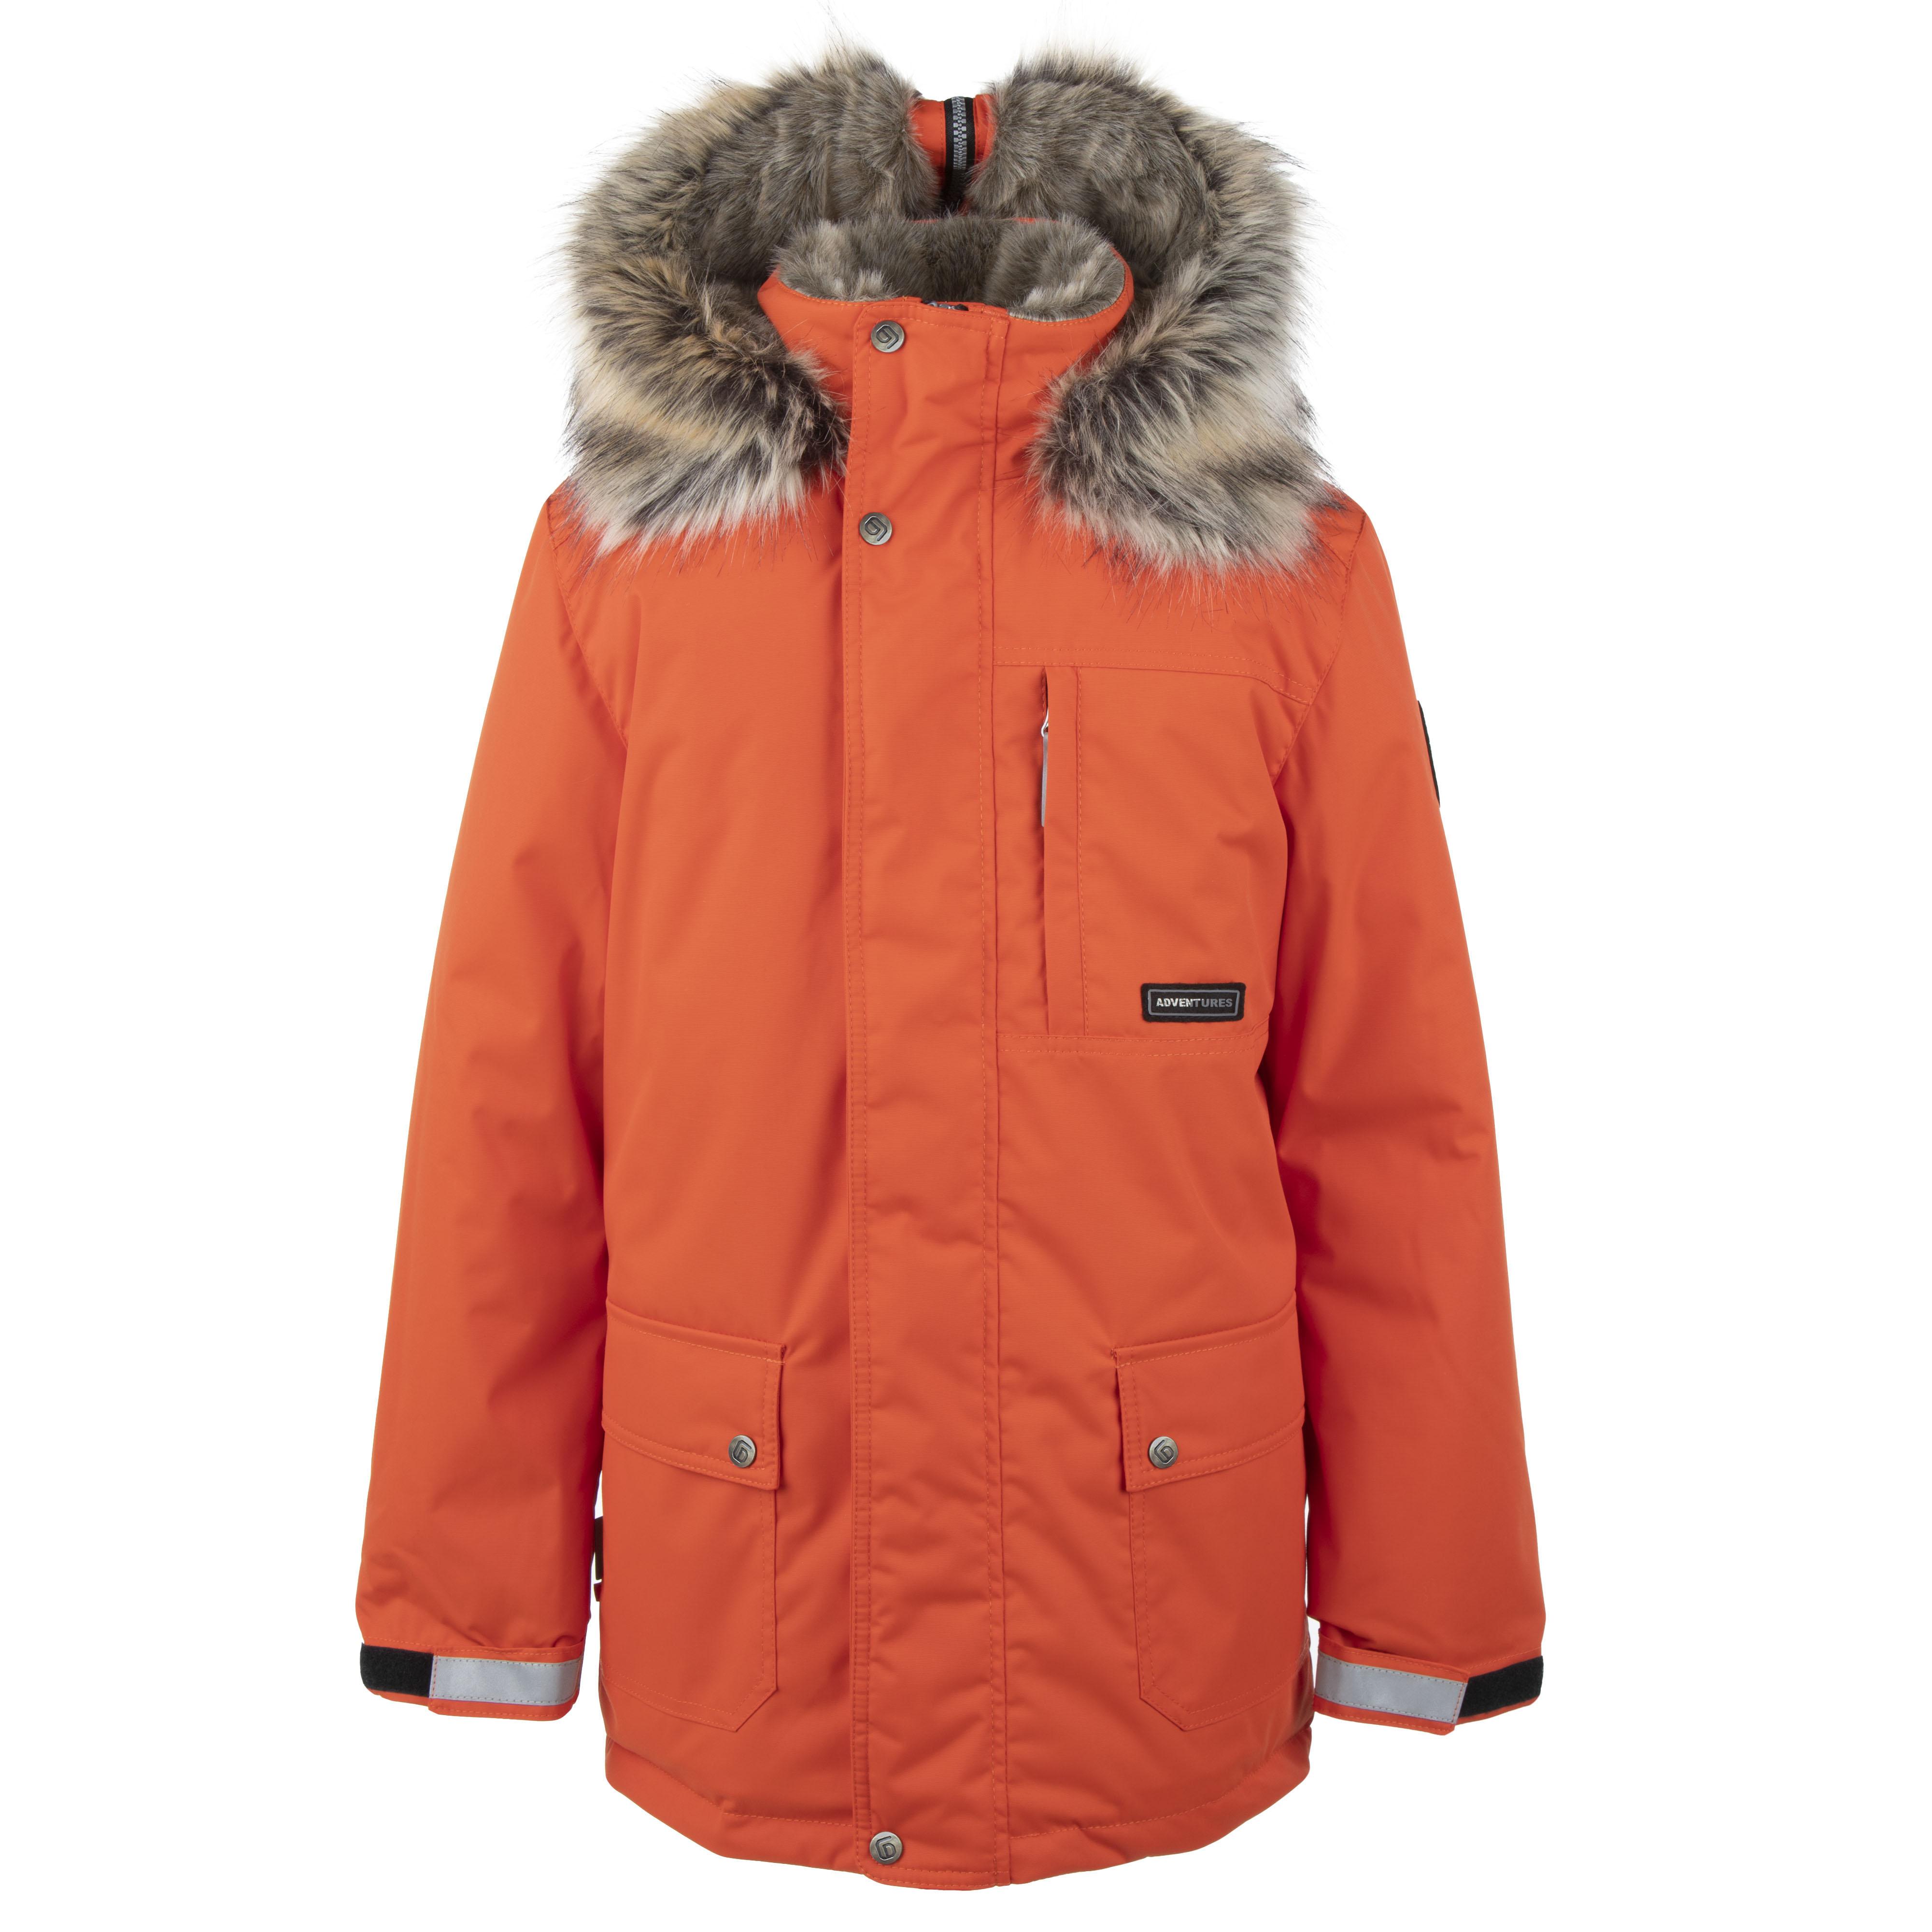 Lenne Jako куртка парка для мальчика оранжевая 20368/455